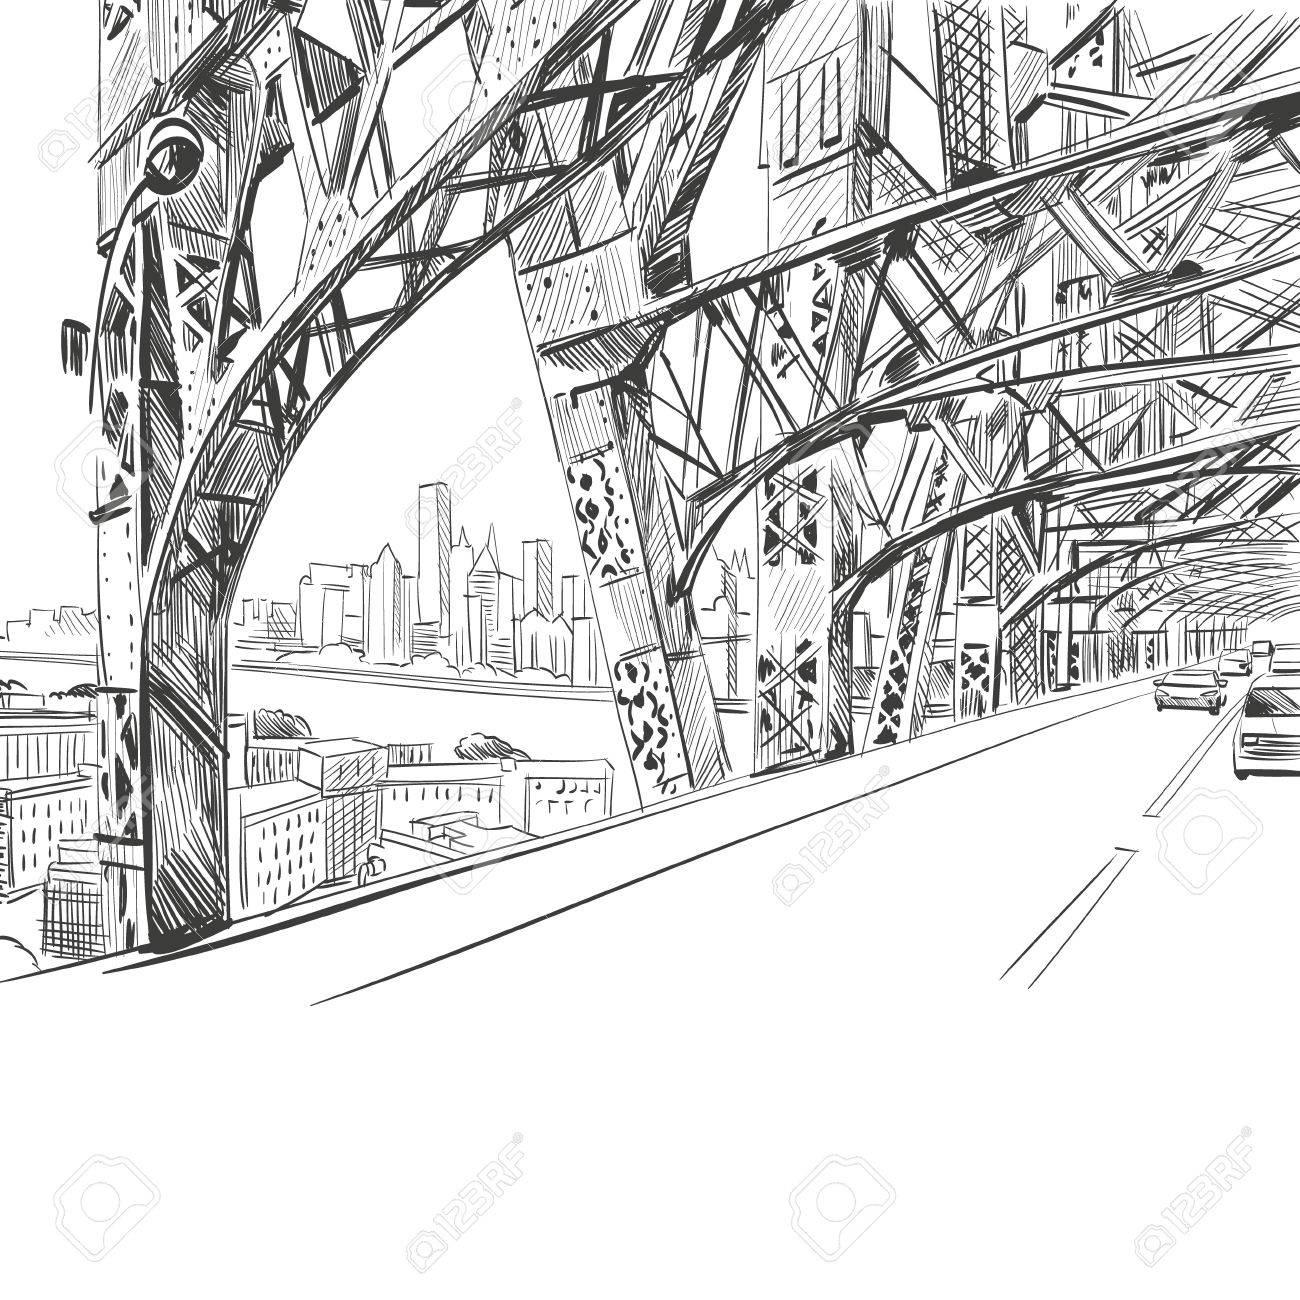 Bridge hand drawn, vector illustration - 34073236